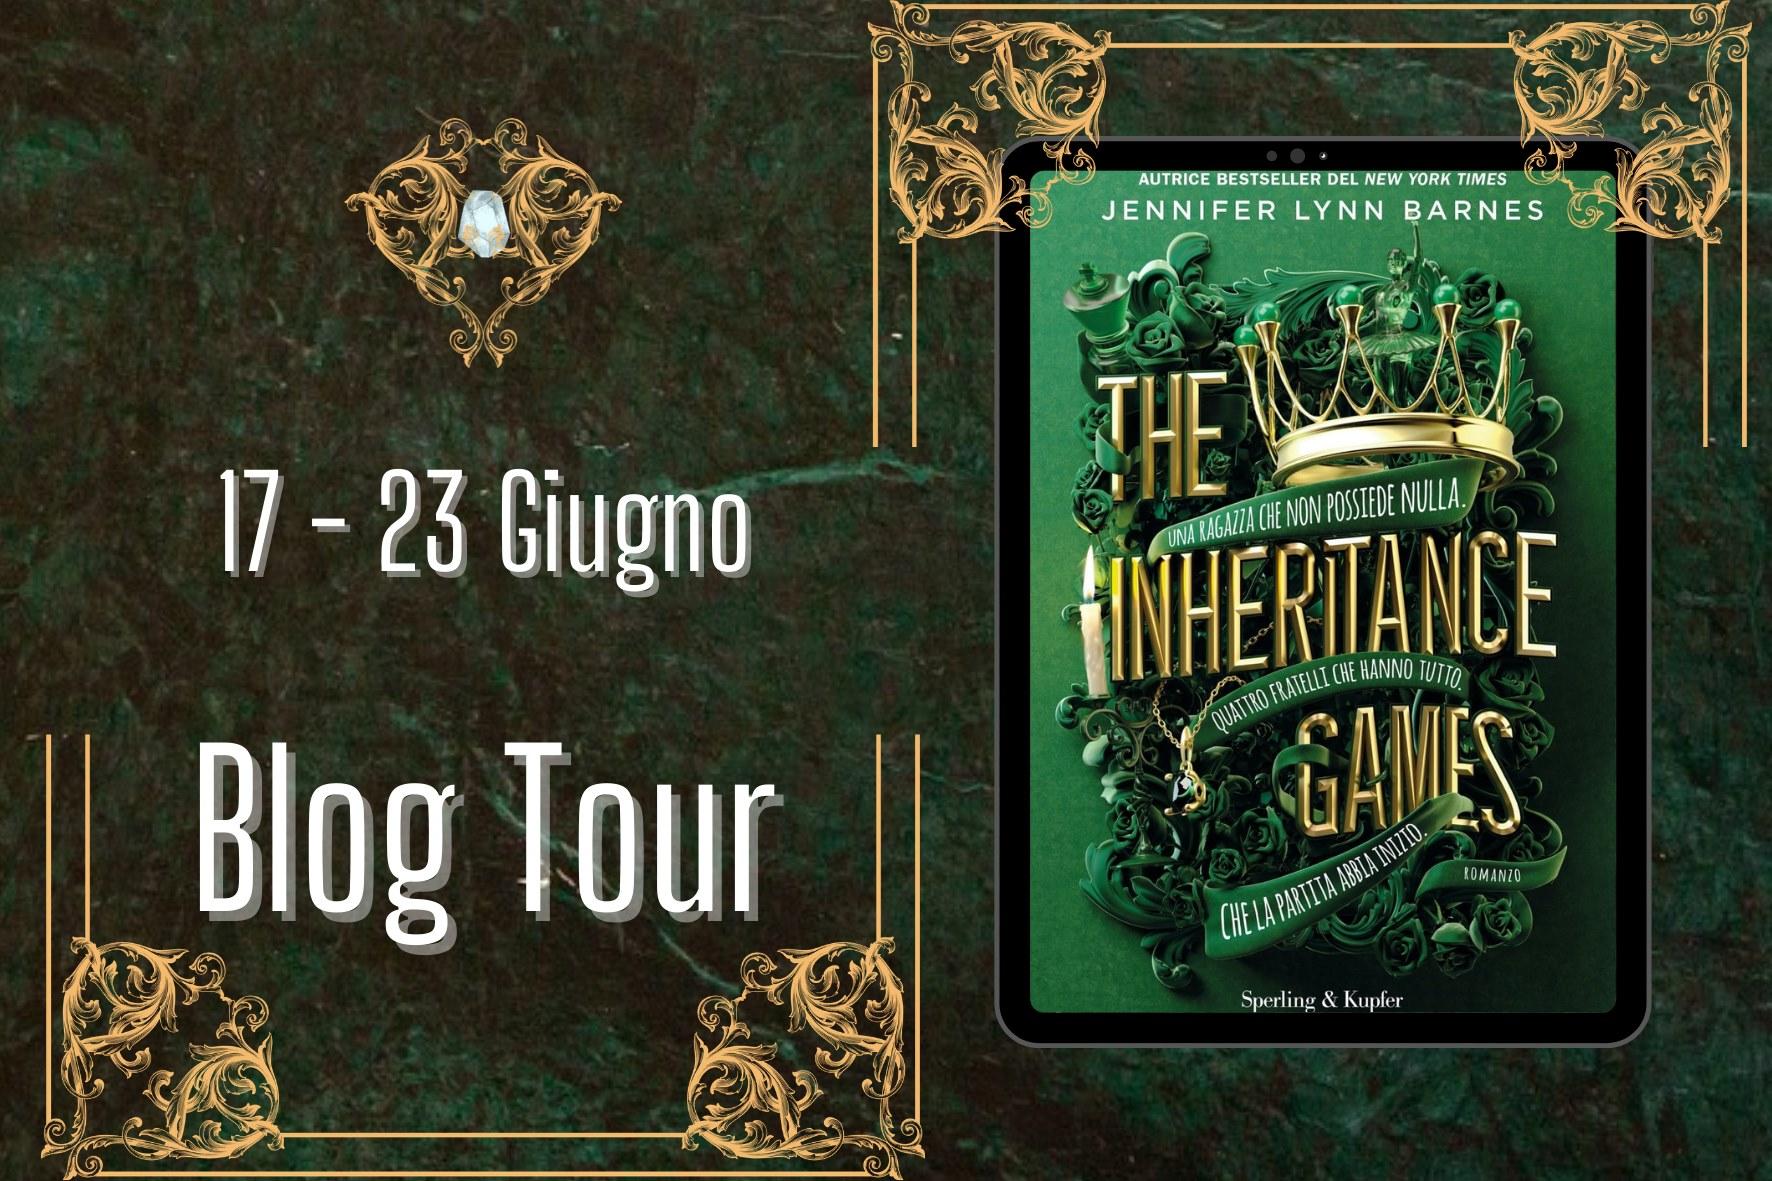 Blogtour - Nash and generosity - The inheritance games by Jennifer Lynn Barnes